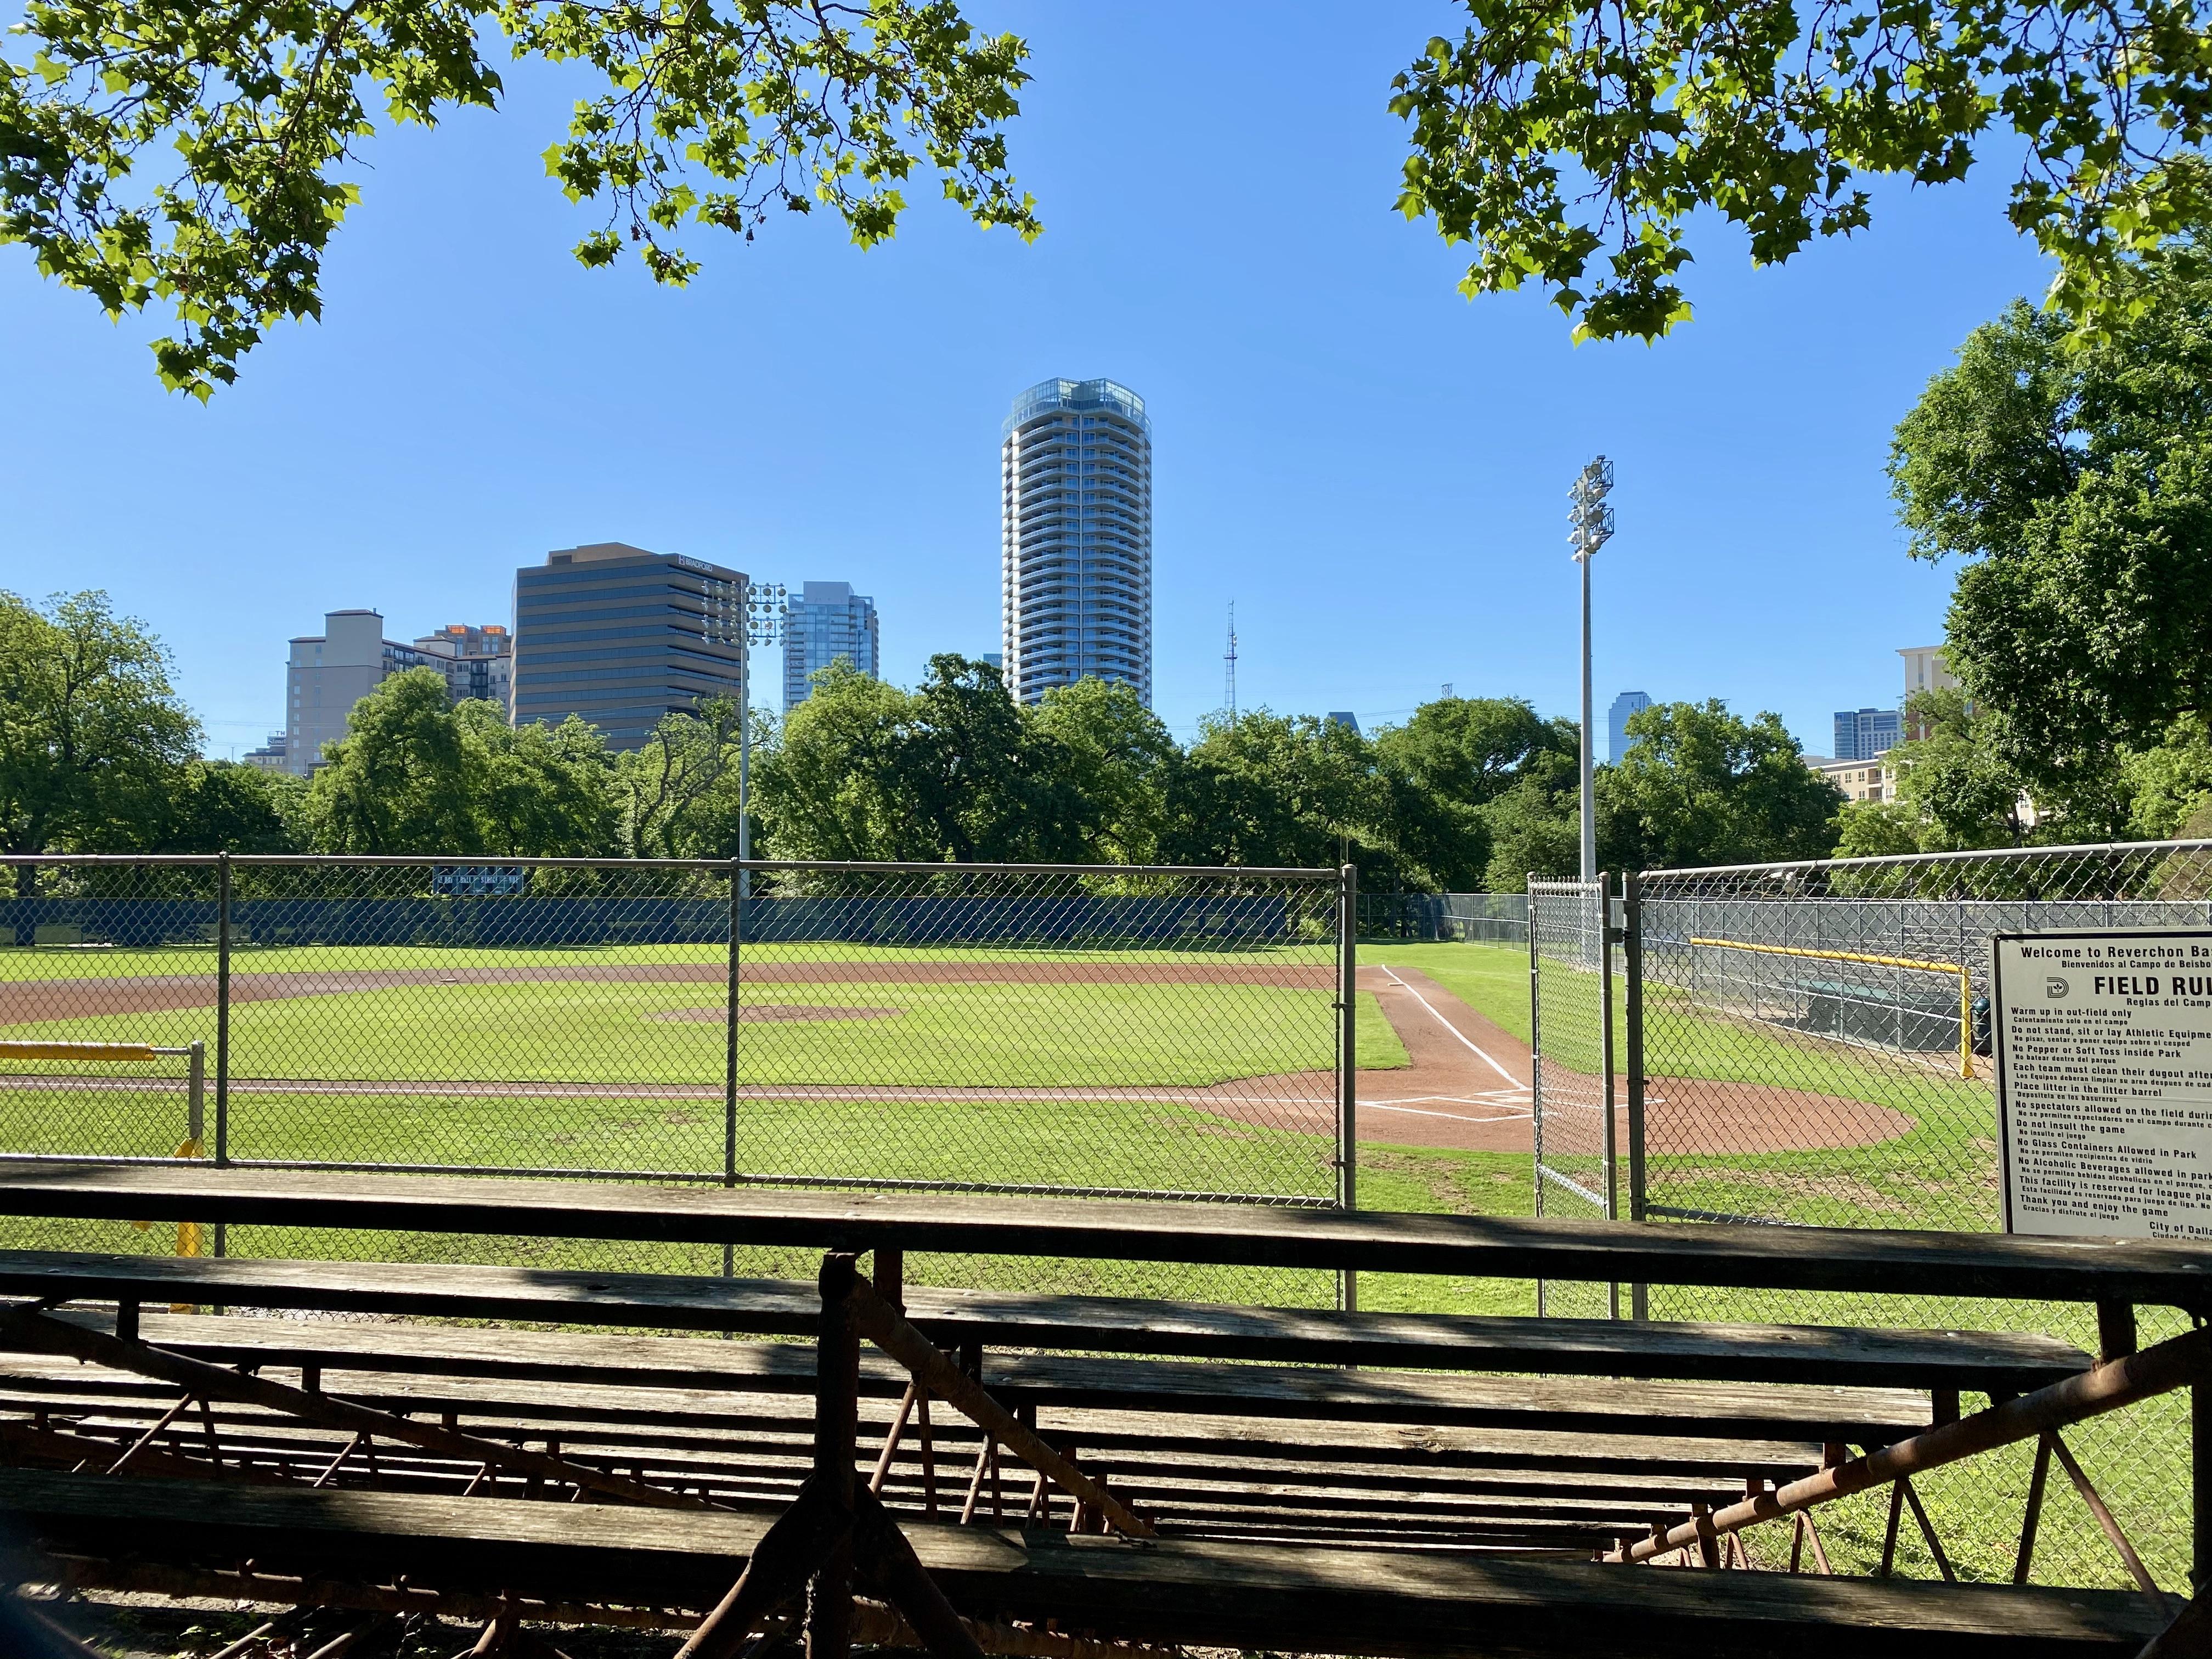 Reverchon Park Baseball Diamond in Uptown Dallas, TX